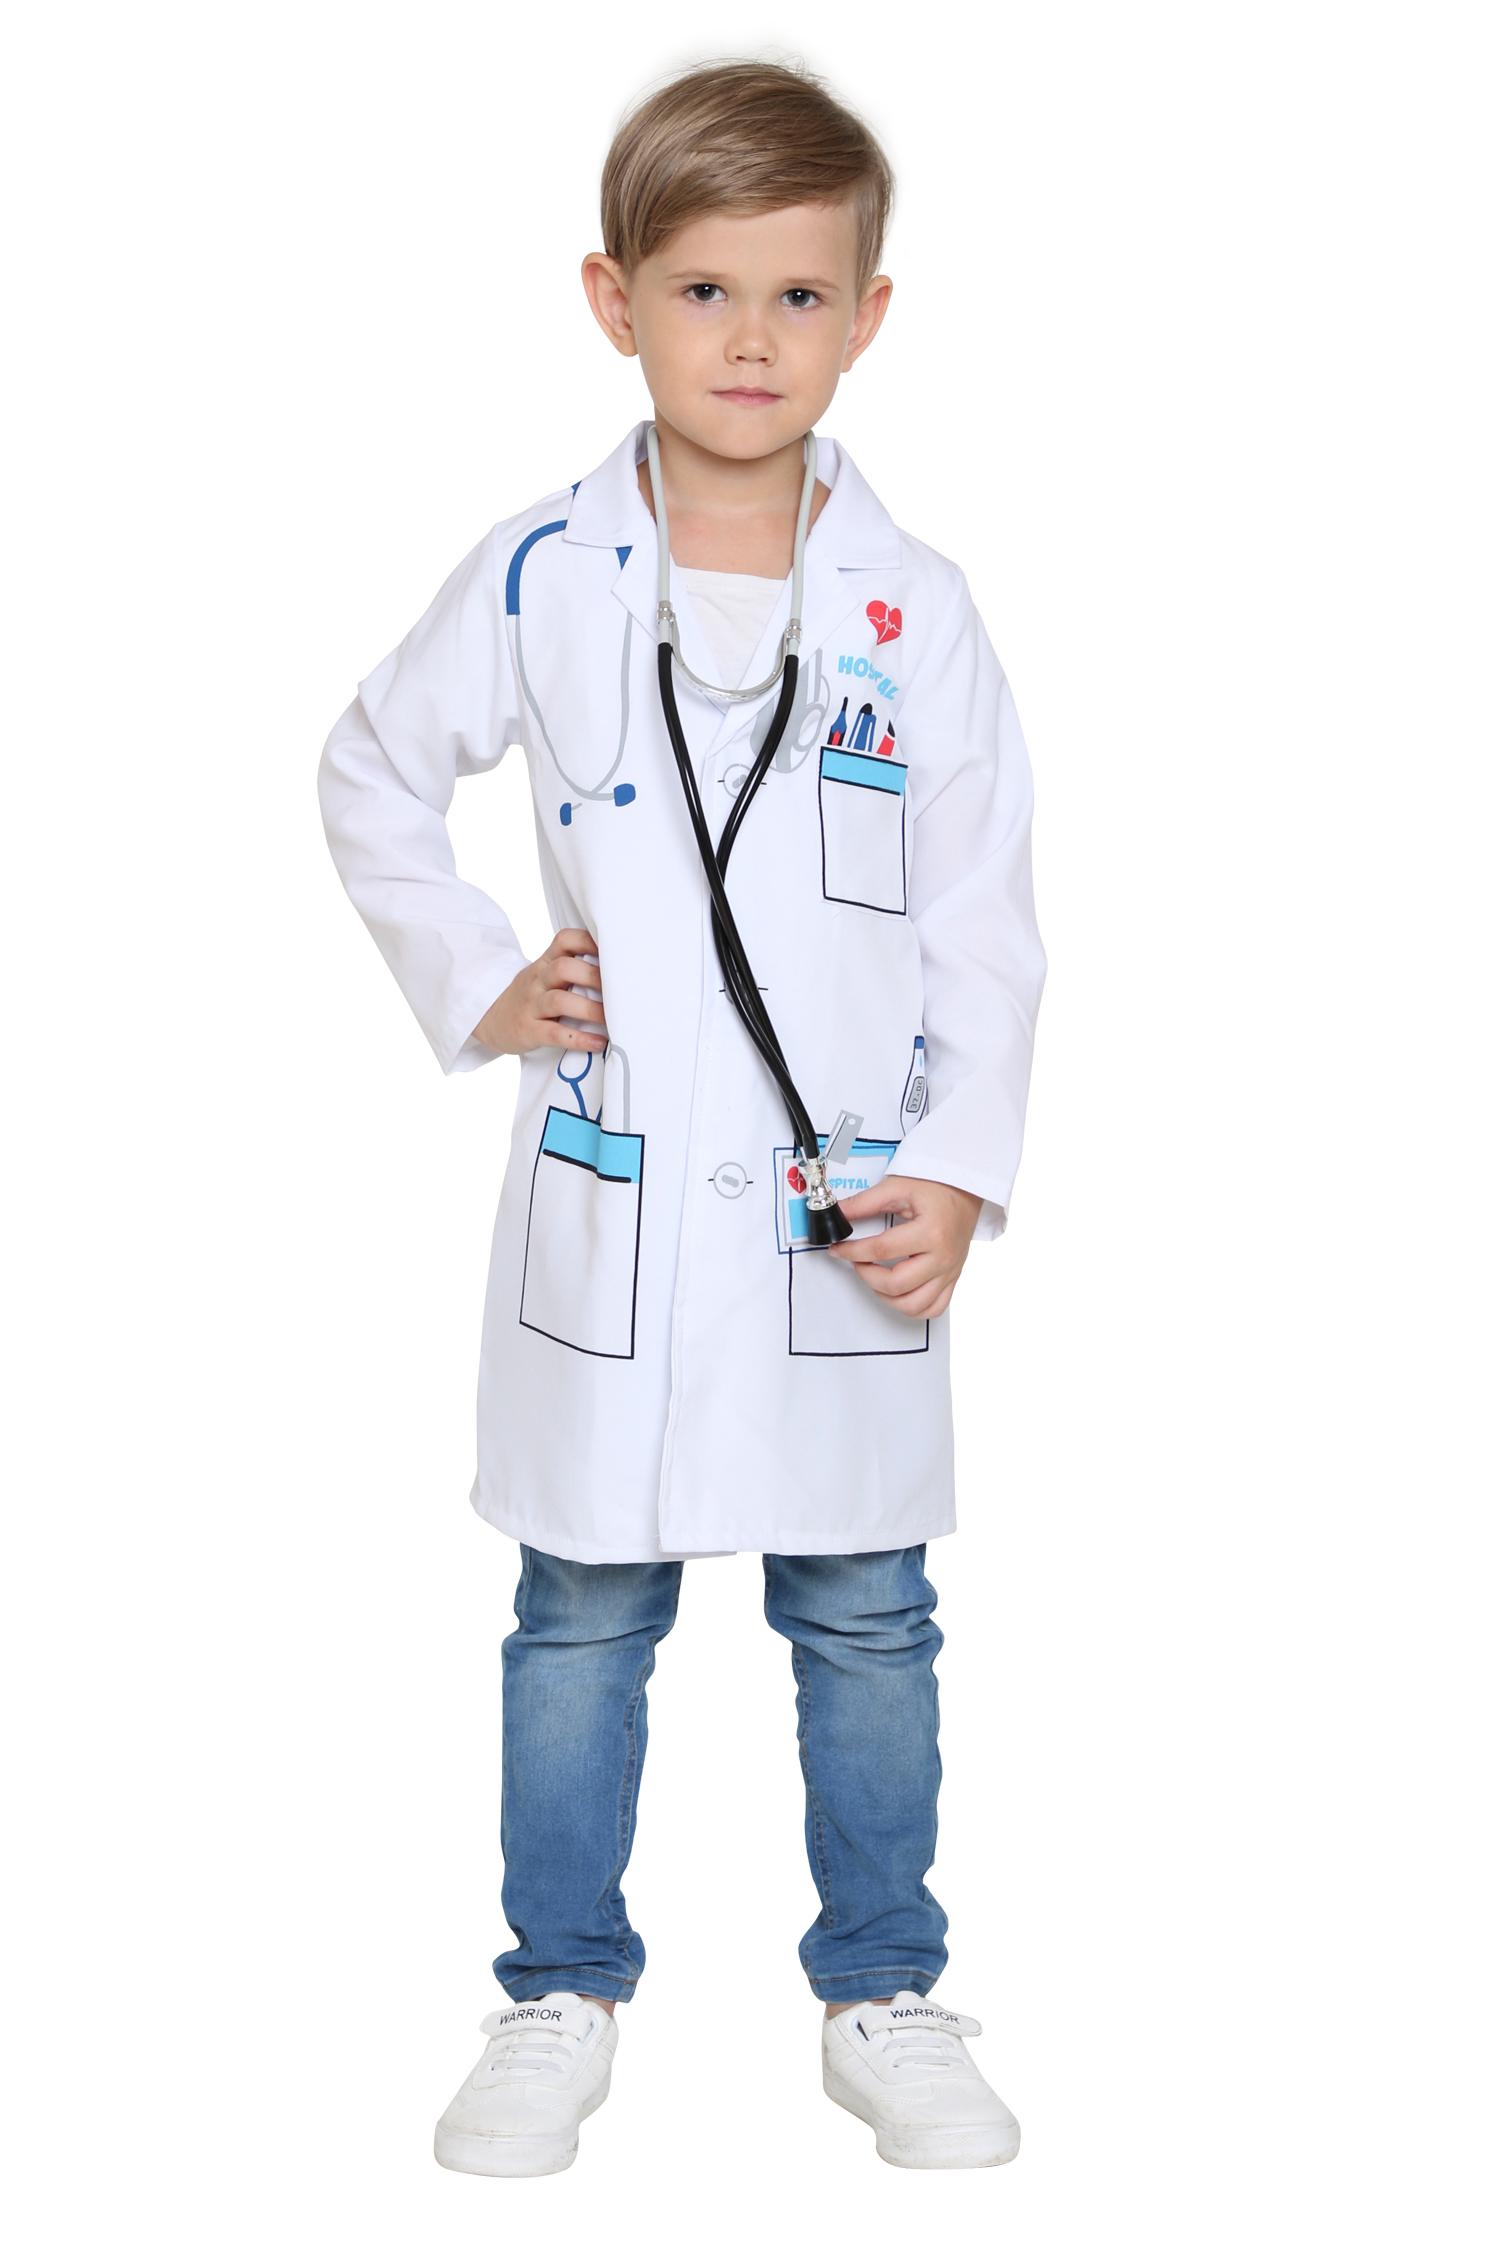 Boys/&Girls Doctor Medical White Lab Coat Costume Super Soft Kid Cosplay Uniform